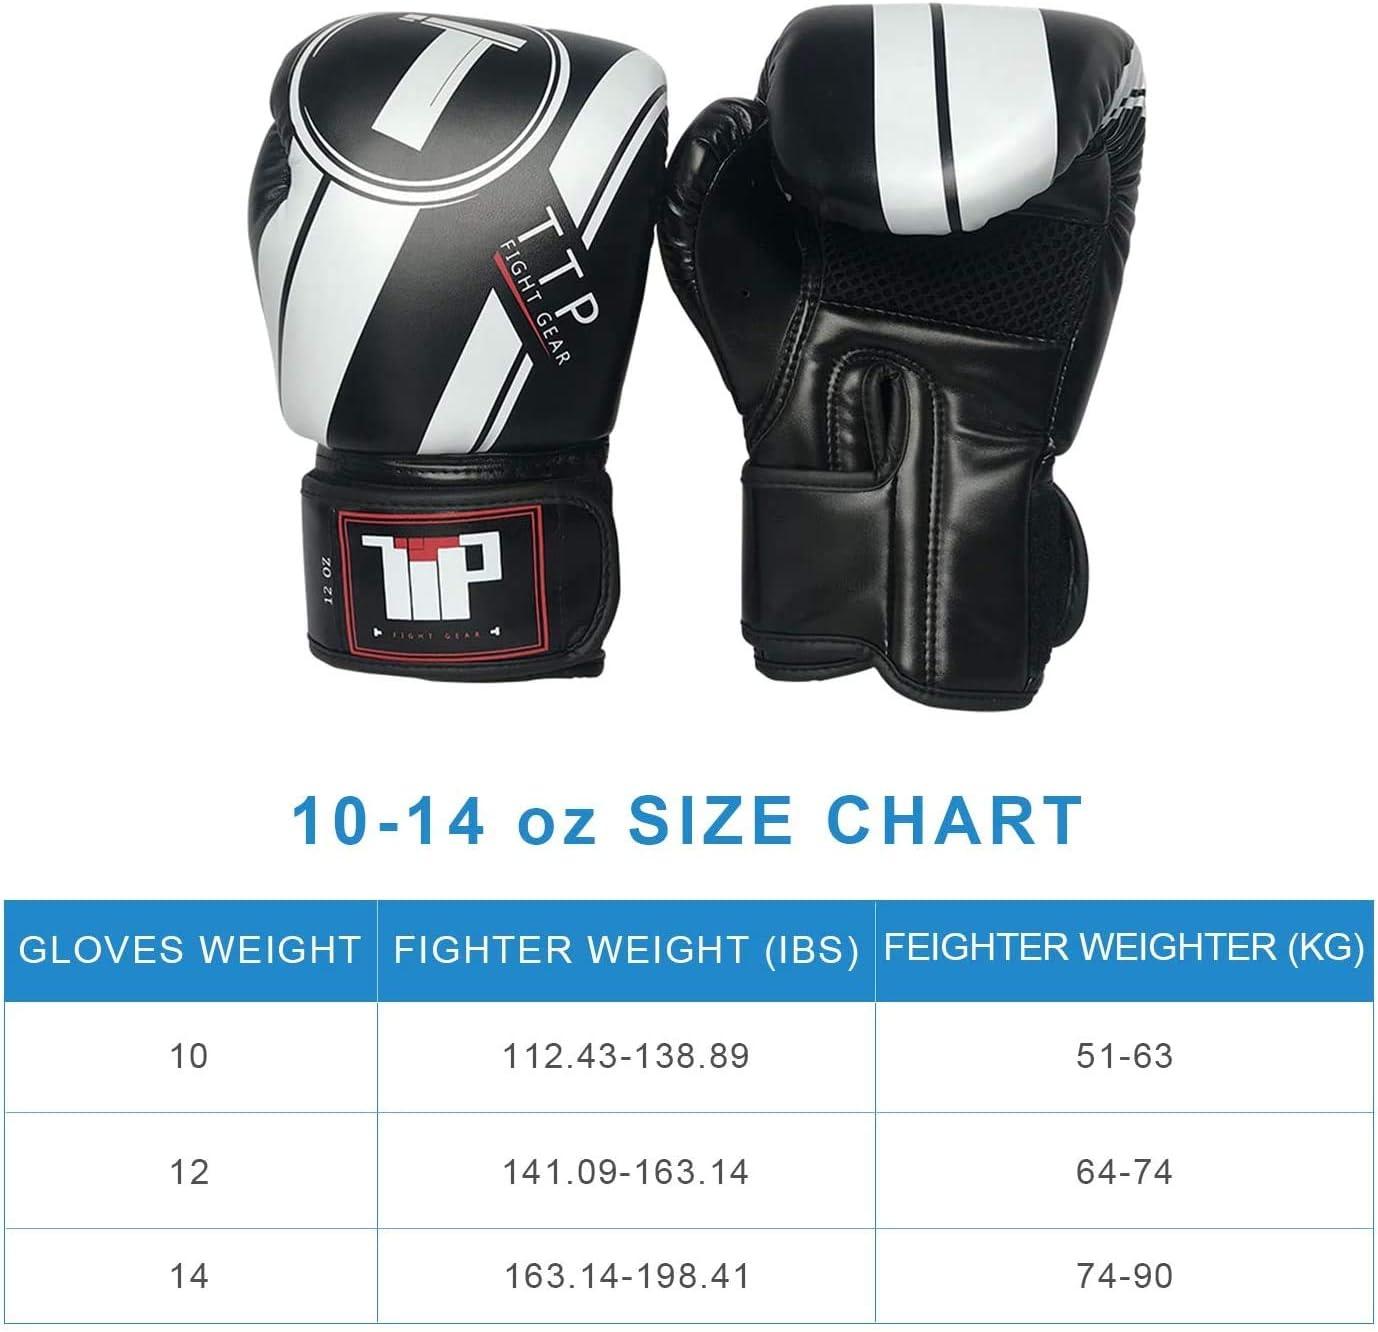 Punching Bag Gloves with Adjustable Wrist Band for Men /& Women Boxing Gloves,MMA Boxing Gloves Sparring Kickboxing Muay Thai Fighting Punching Bag Training Gloves